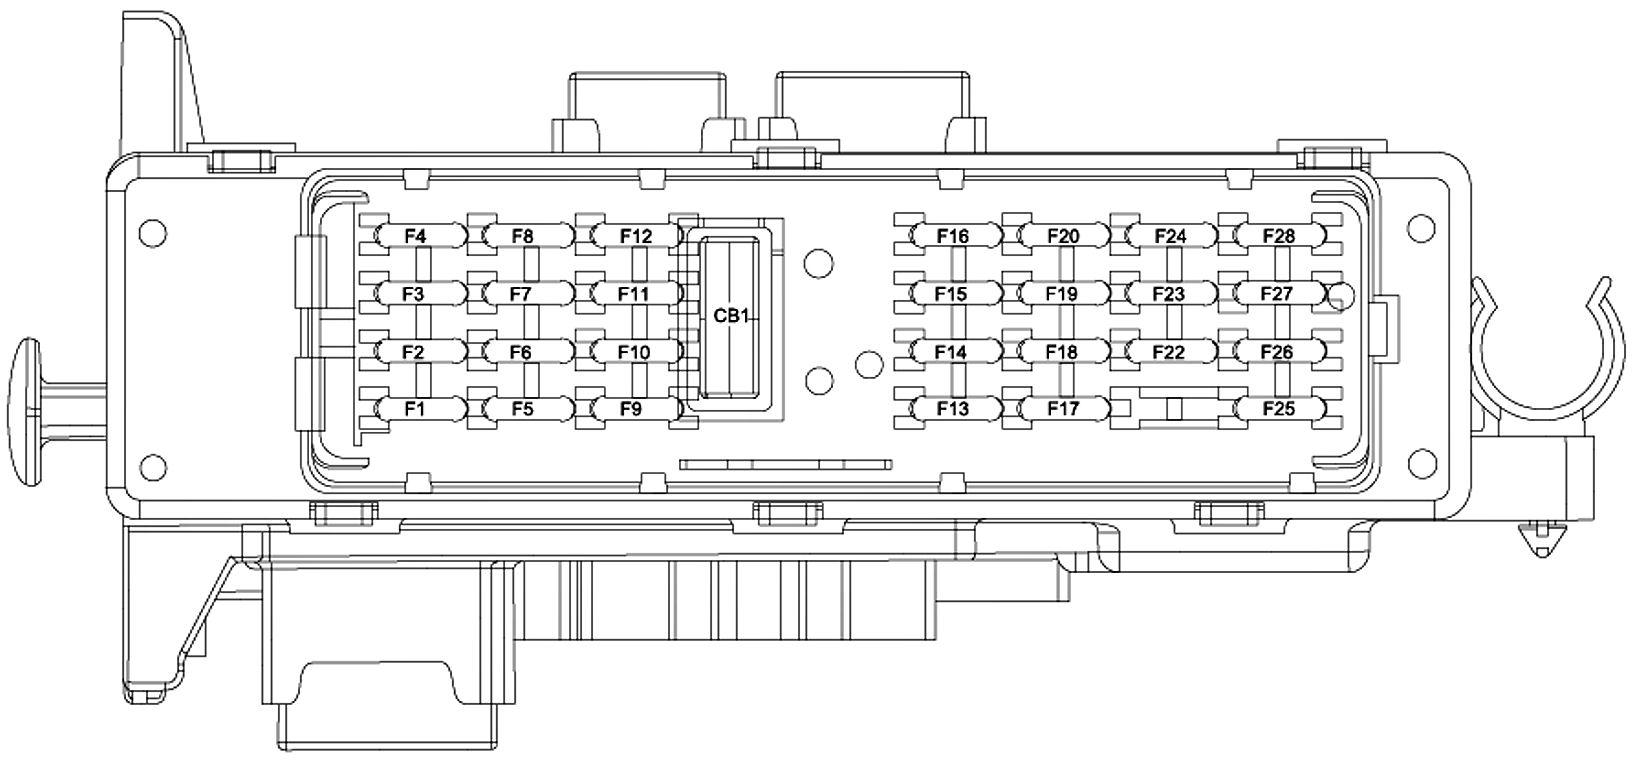 05 mercury mariner fuse box mariner free printable wiring diagrams